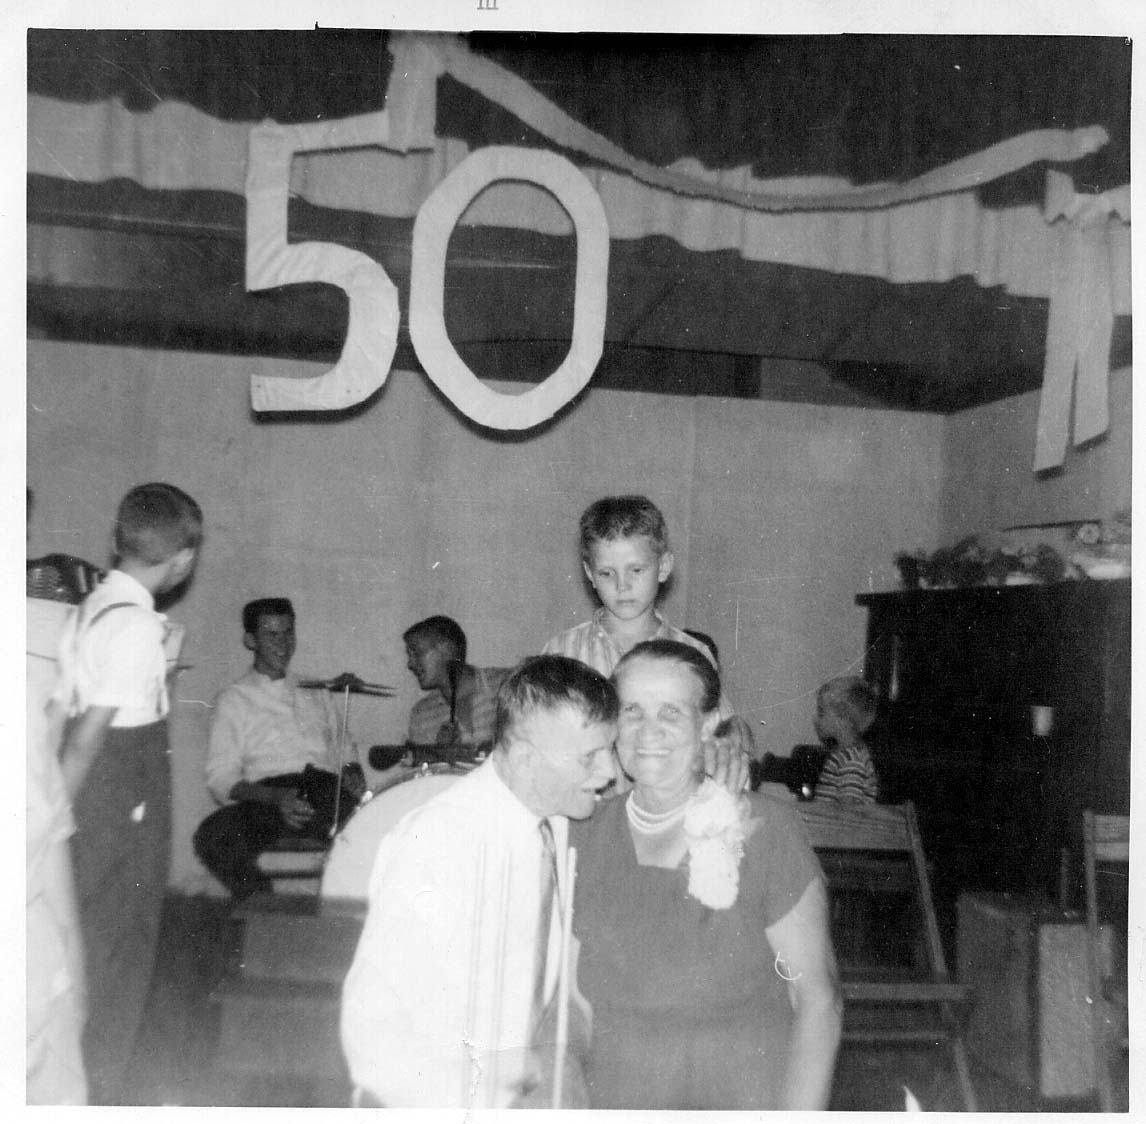 George Caroline 50th